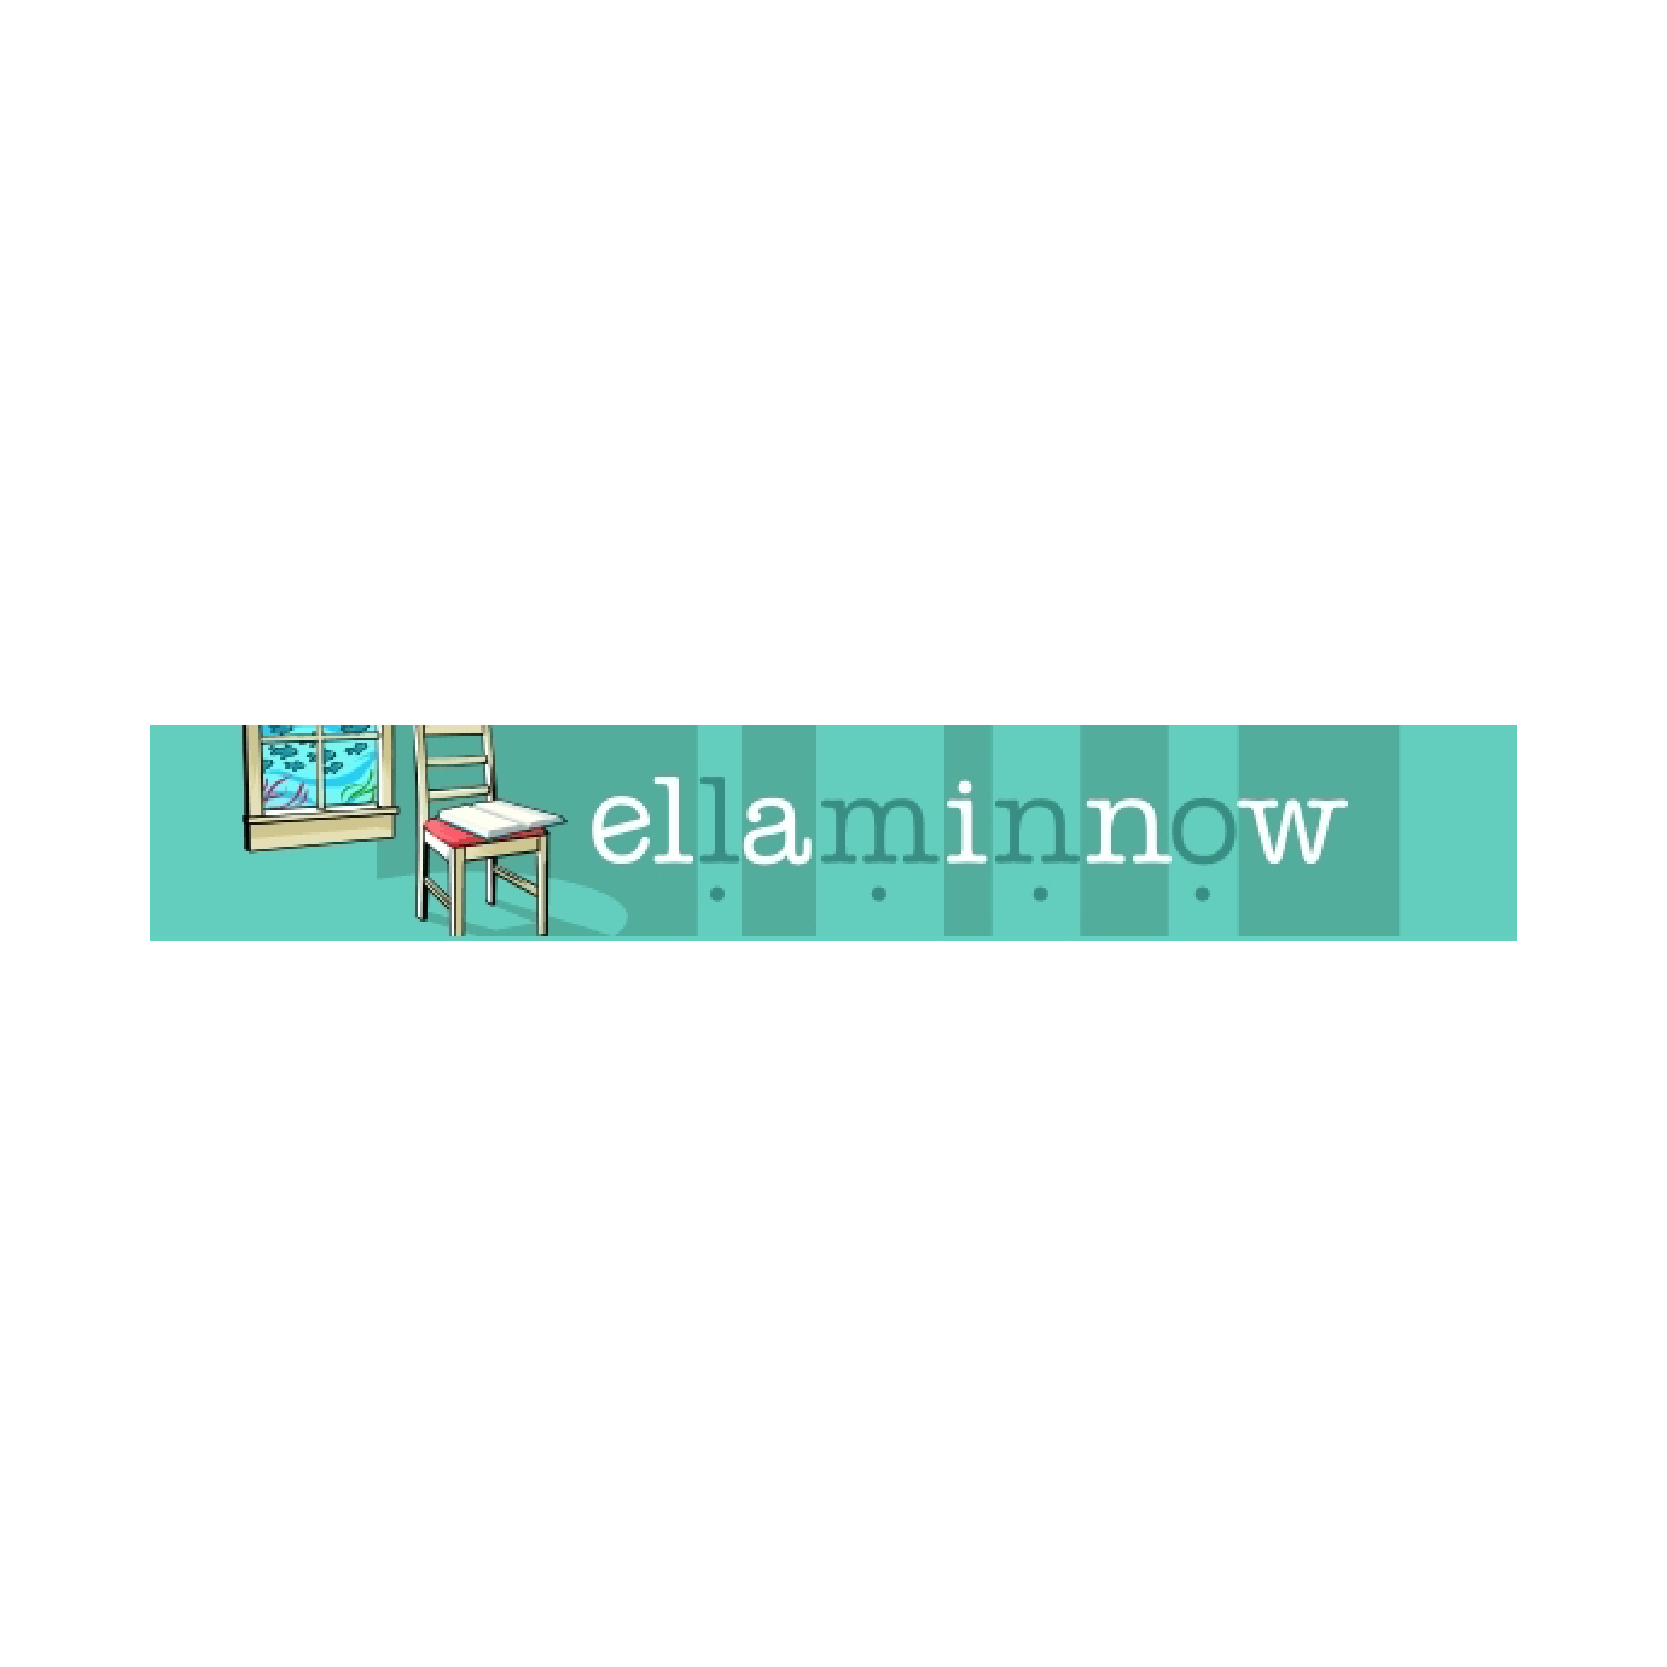 https://ellaminnow.ca/